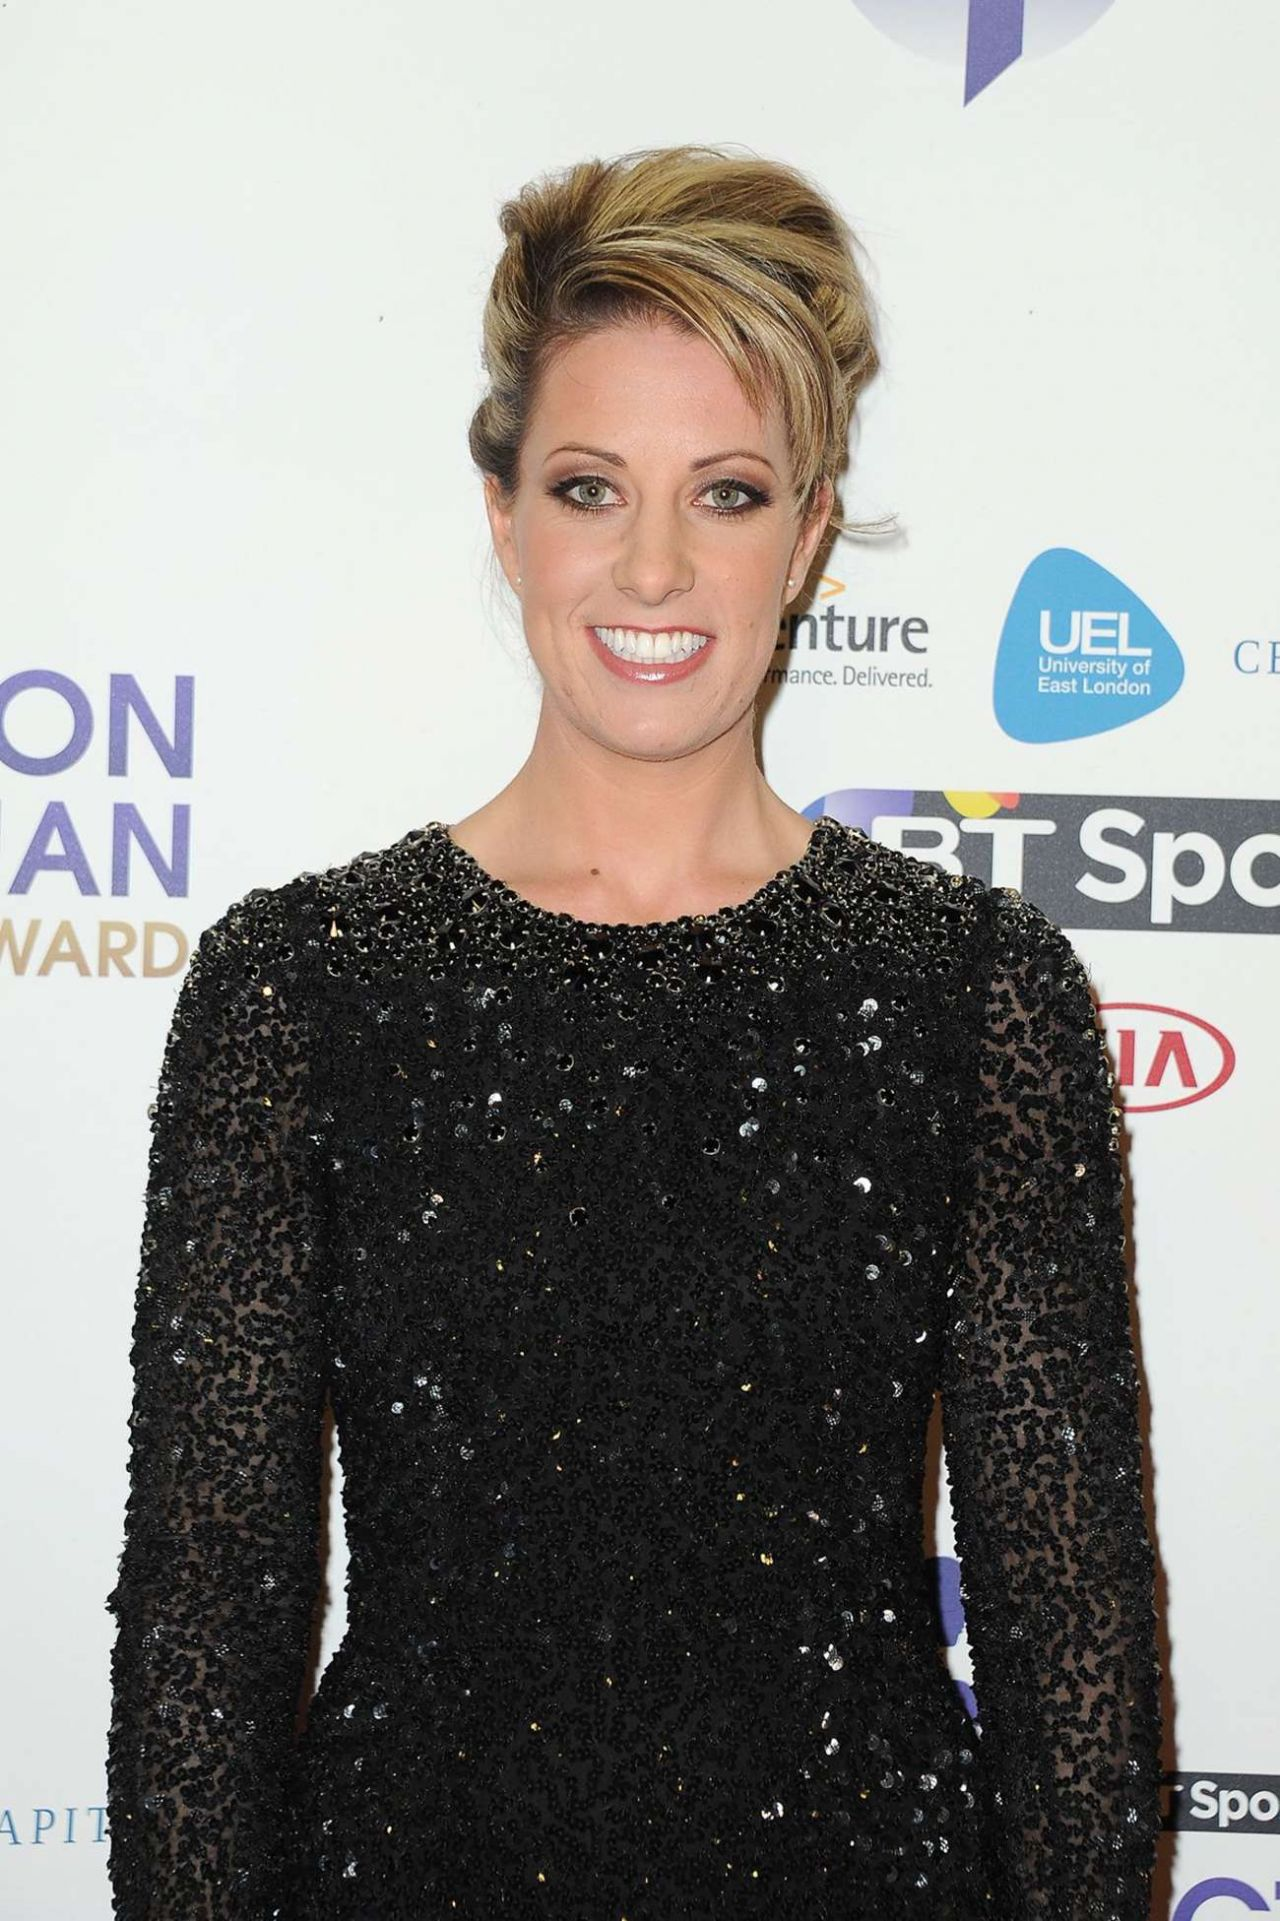 Charlotte dujardin 2014 bt sport action woman awards in for Dujardin olivier